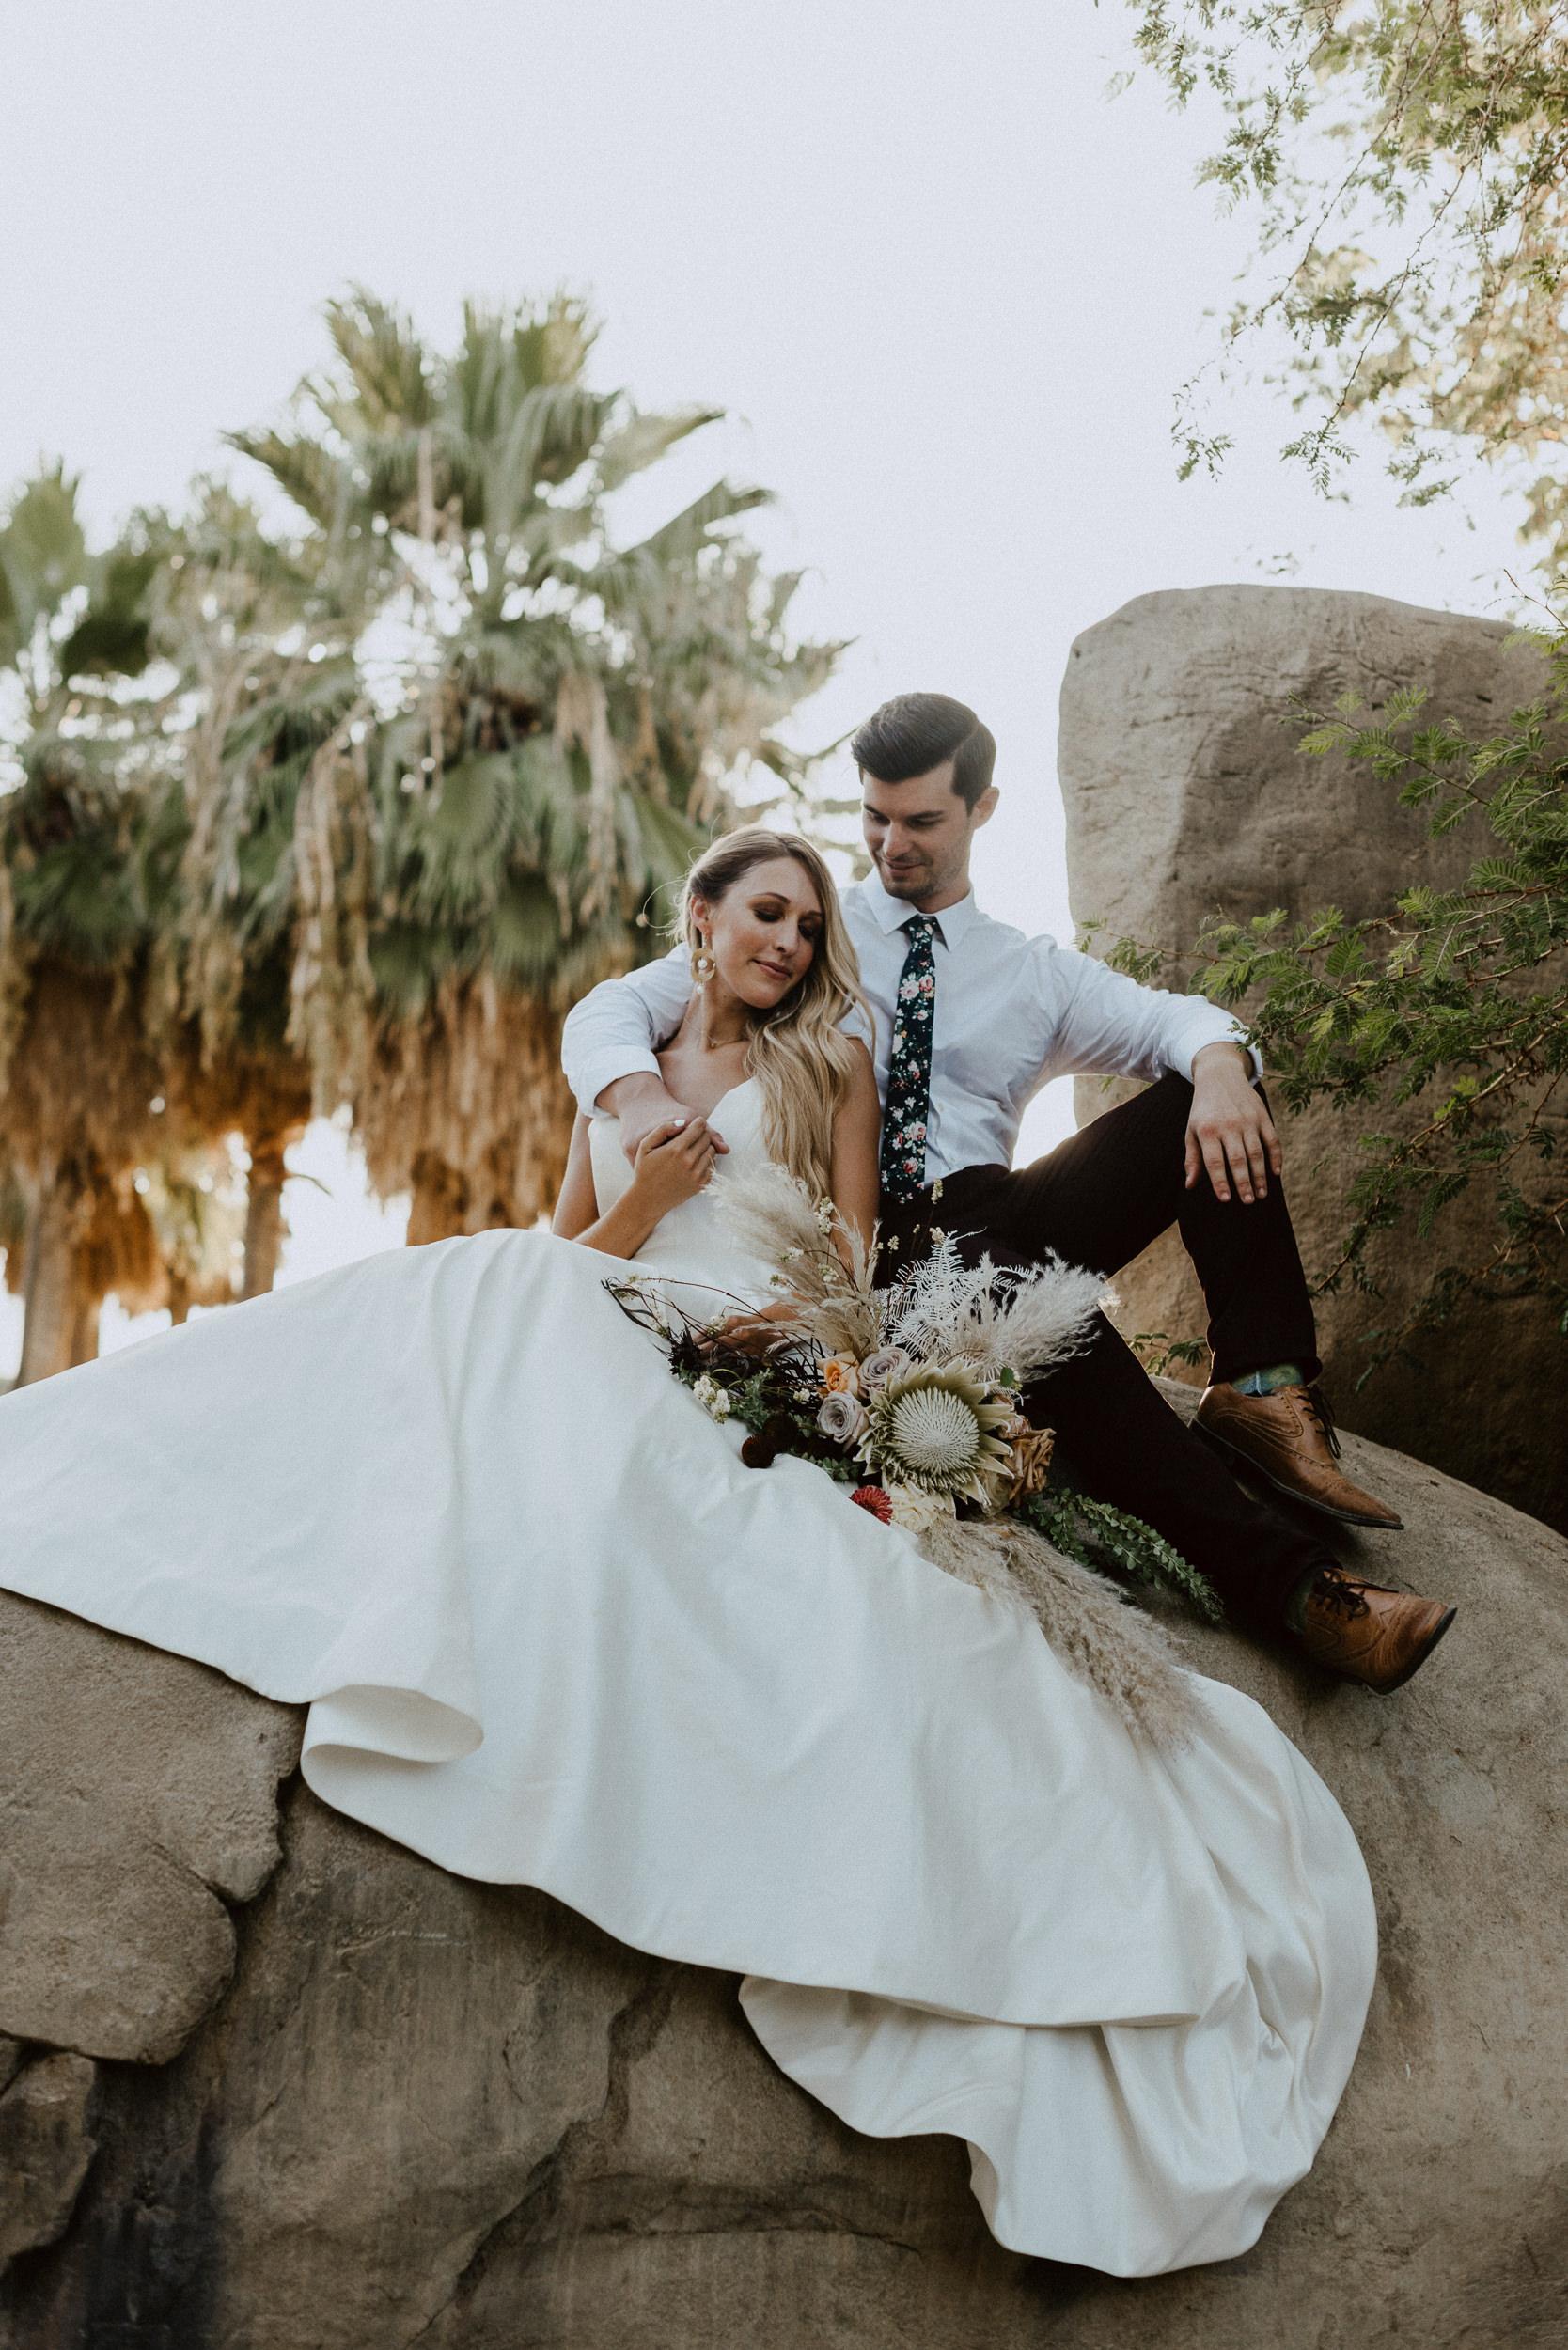 sChelsie + Chris - The Desert Shootout Wedding Romantics at The Living Desert-100.jpg